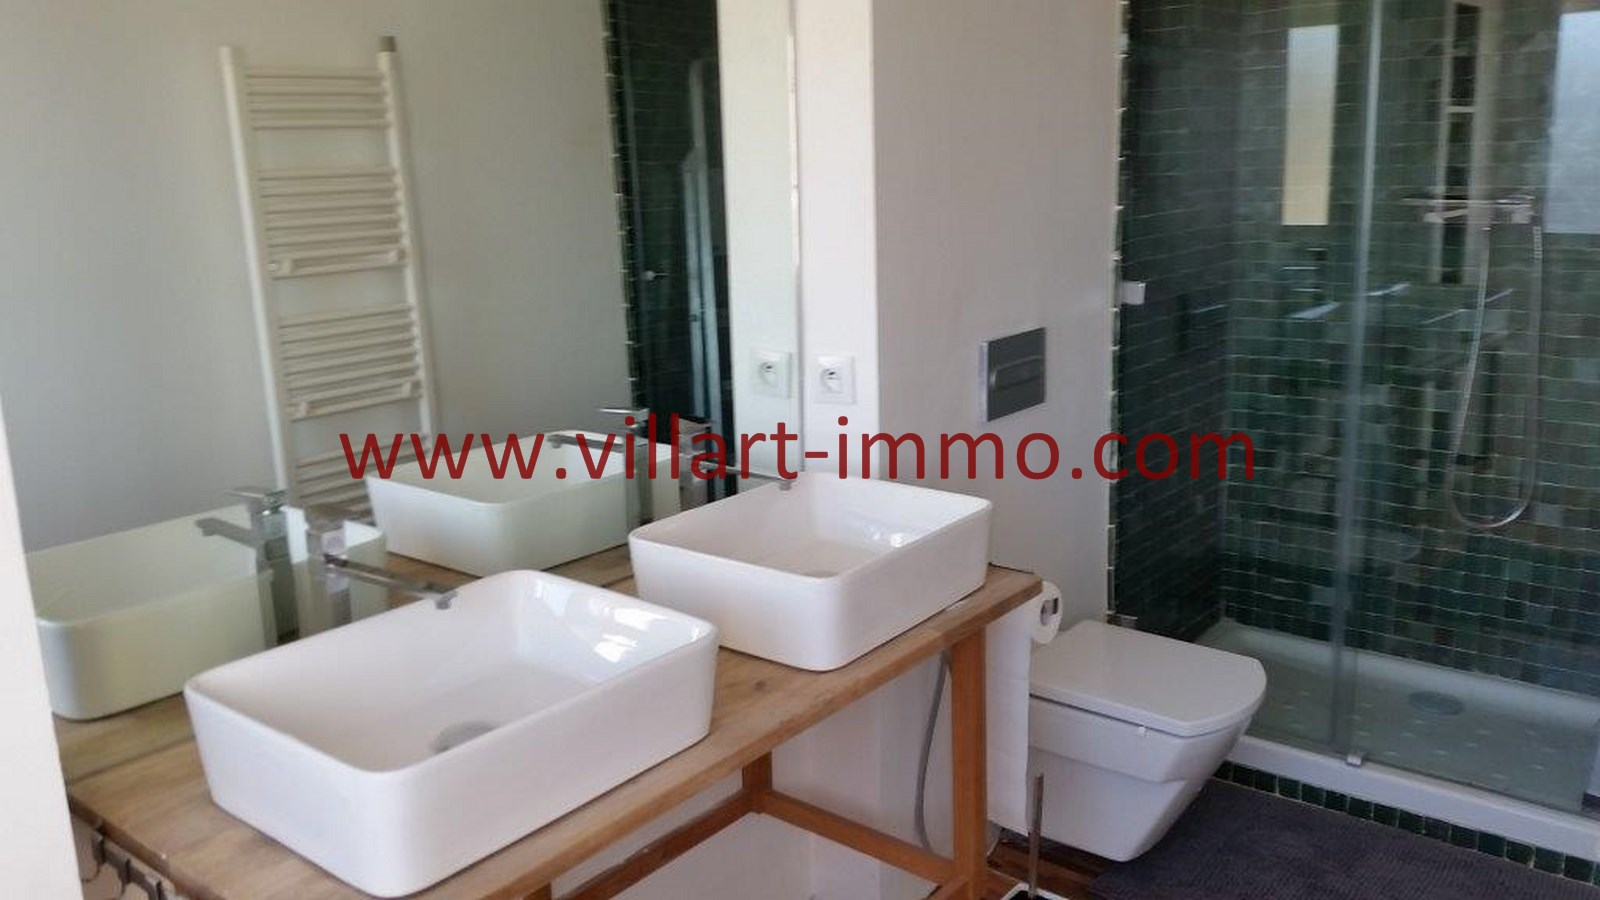 12-Vente-Appartement-Tanger-Centre-De-Ville-Salle de bain-VA518-Villart Immo